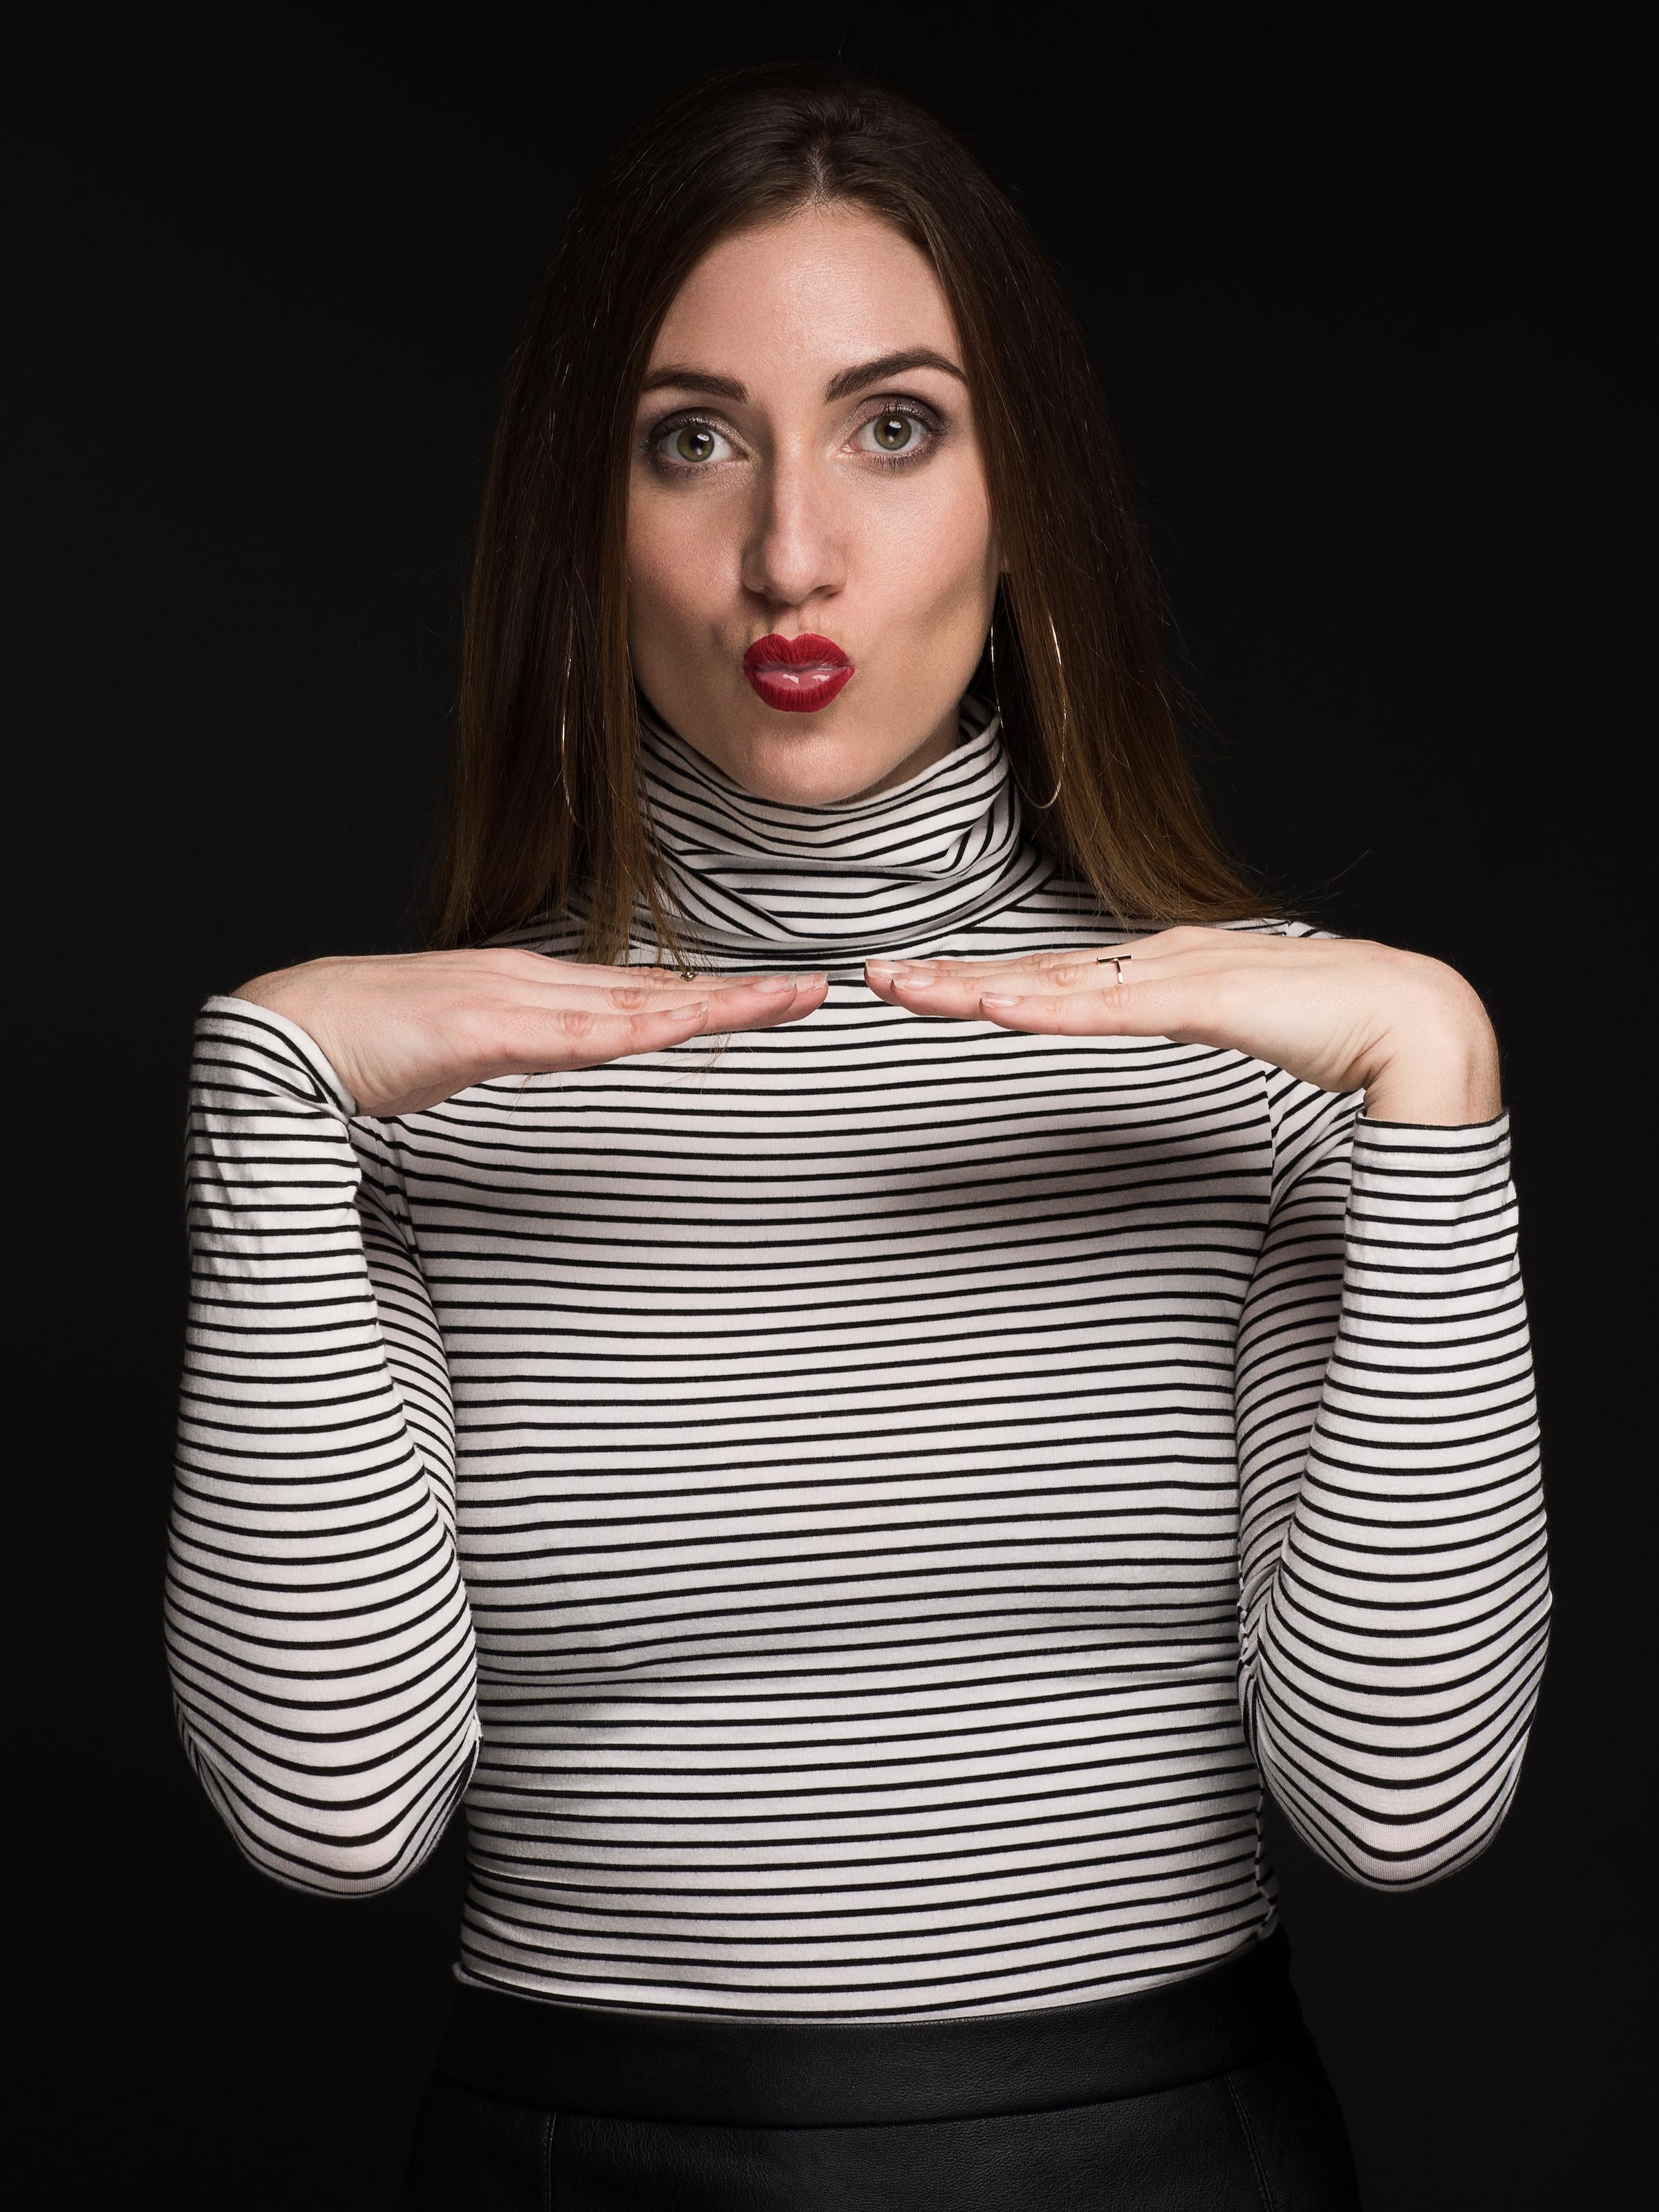 Marie-Poppins-Kevin-Lam-Seck-Photographe-Montpellier-Los-Angeles-Photographer-KLS_1002+%281%29.jpg